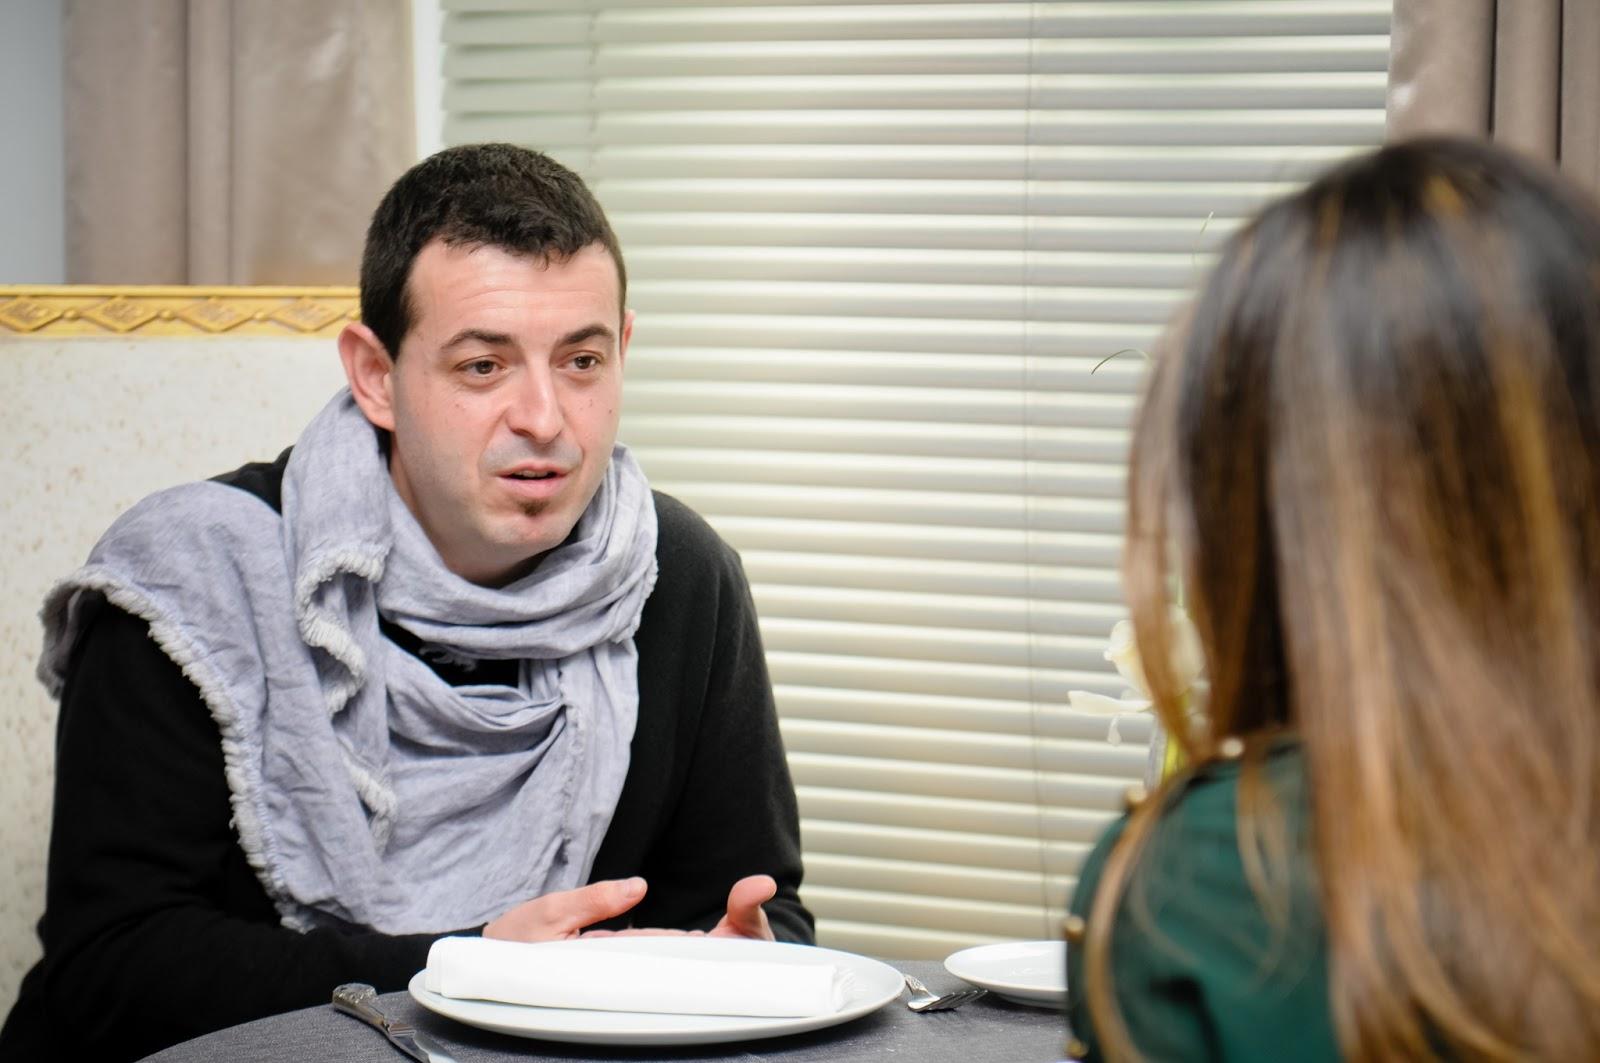 Entrevista Ricard Camarena por Sandra Blasco - Foto Xosé Castro